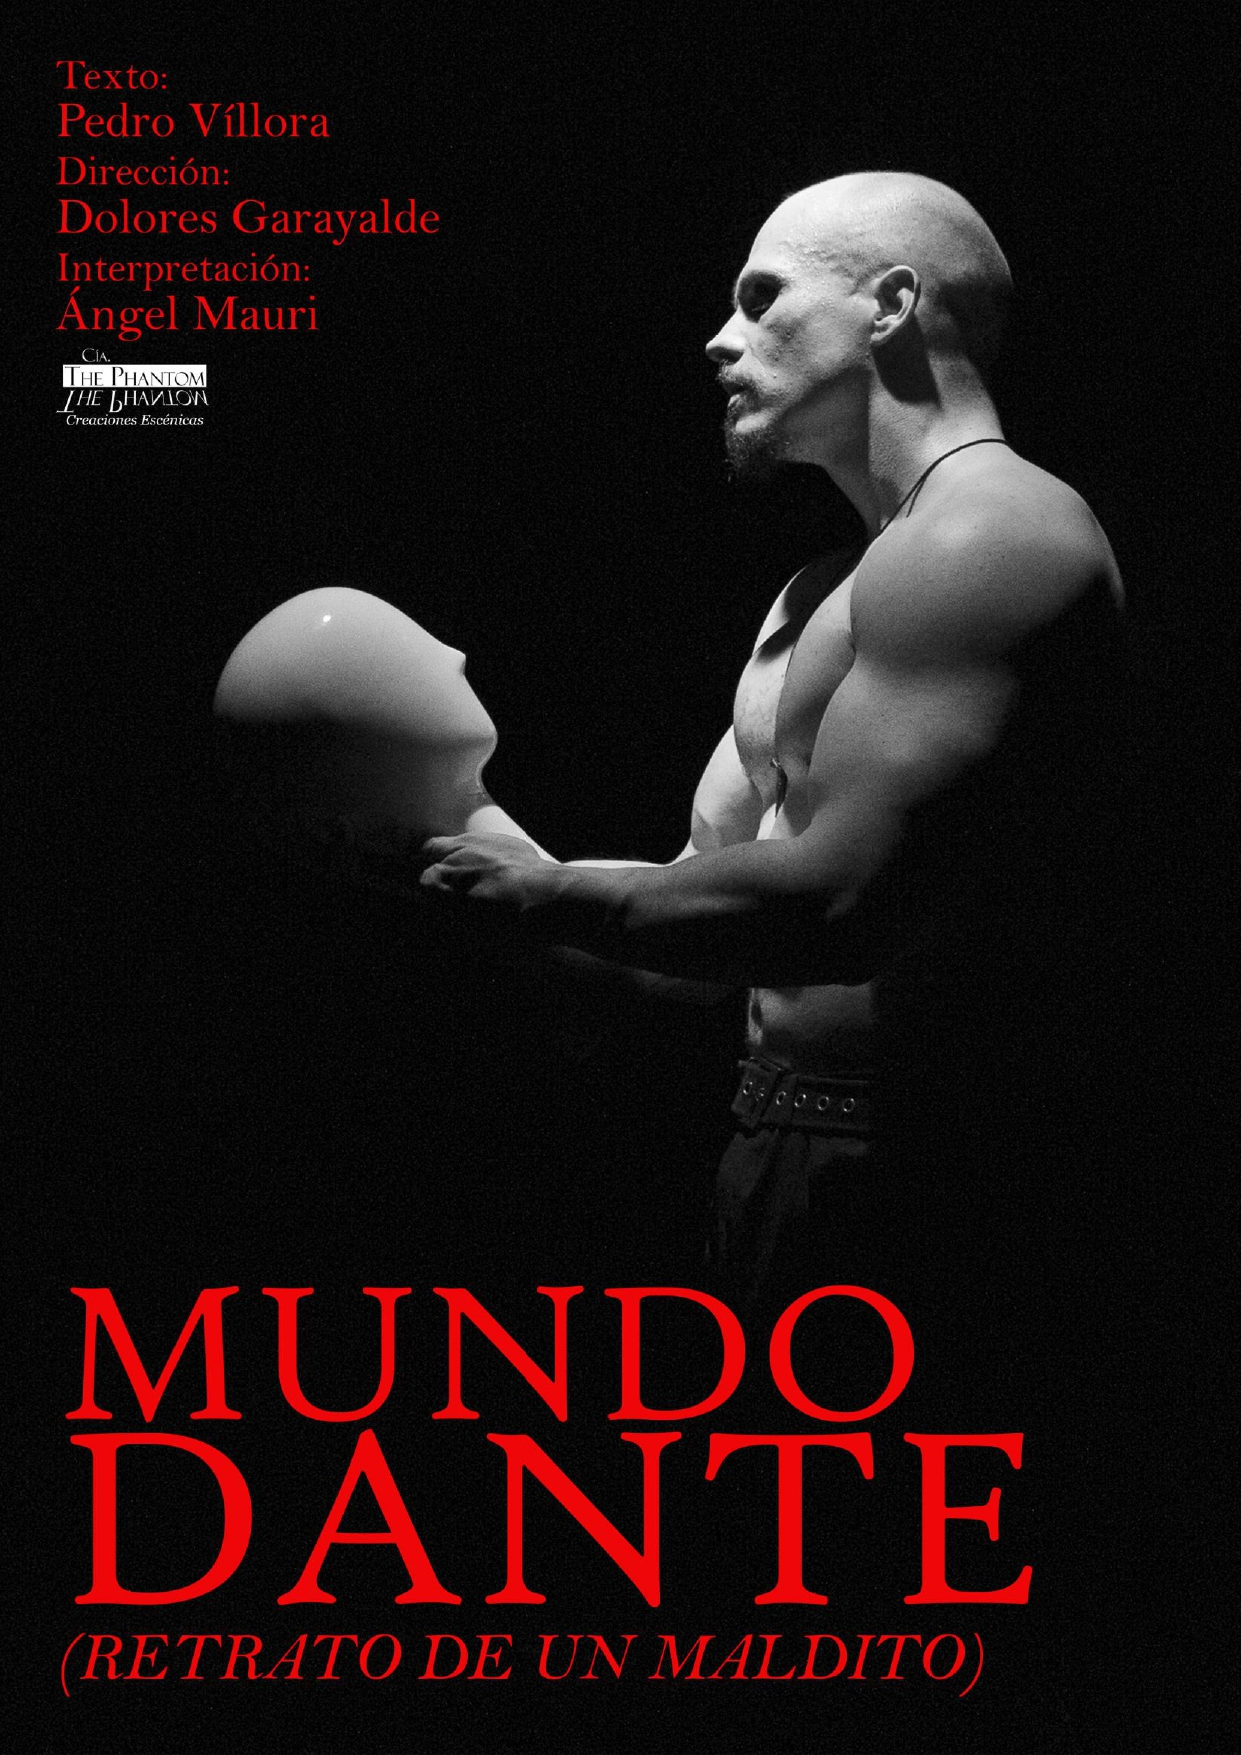 Obra de teatro. Mundo Dante.